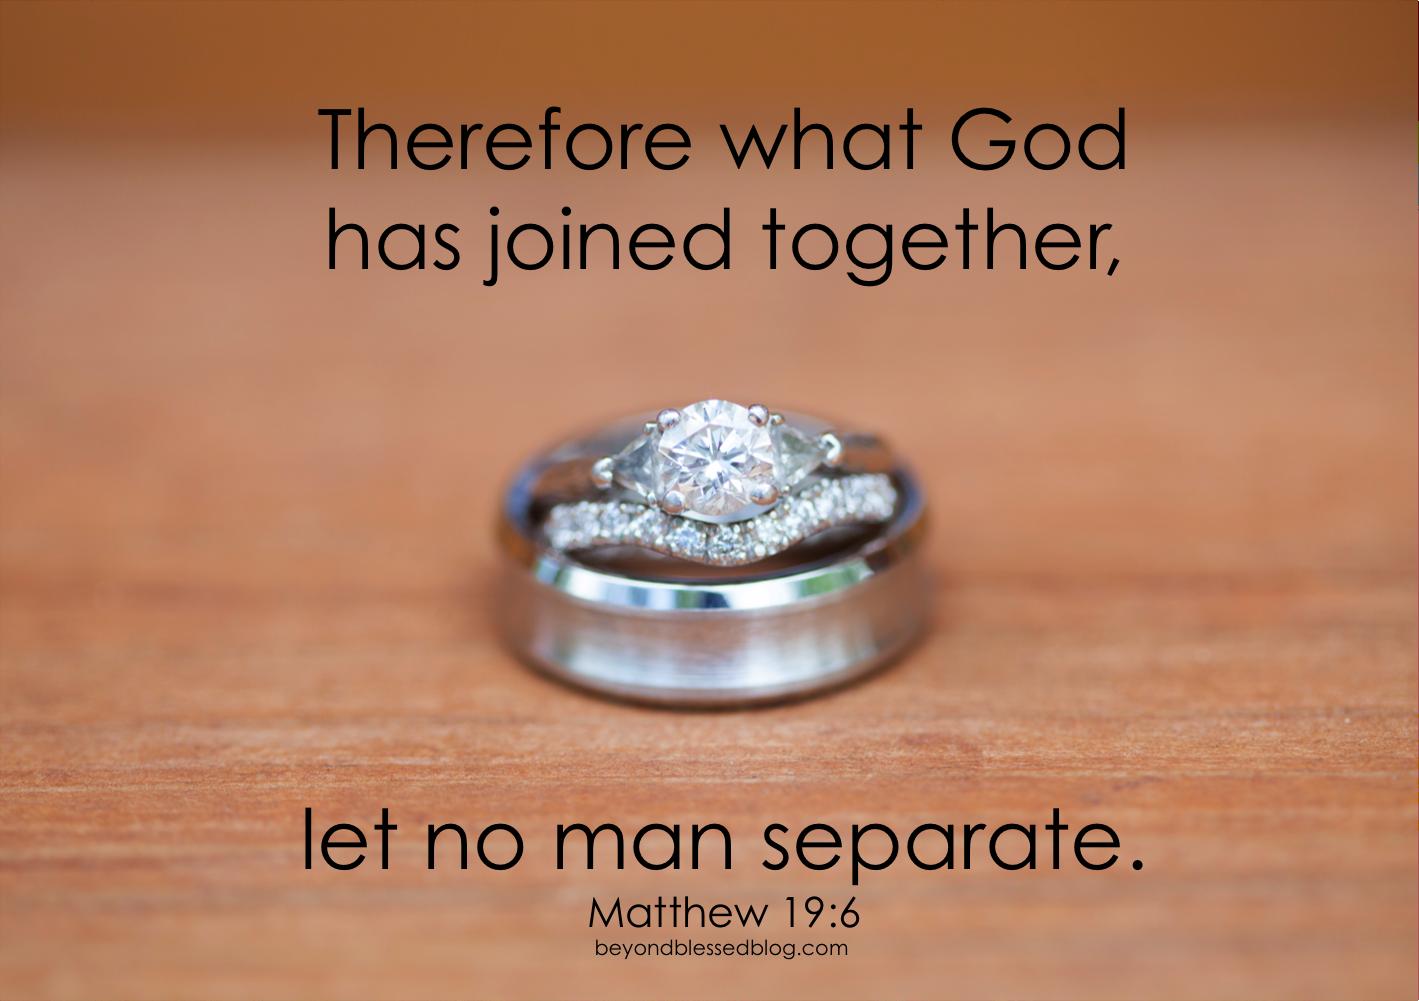 Matthew19-6 BBB - beyond blessed